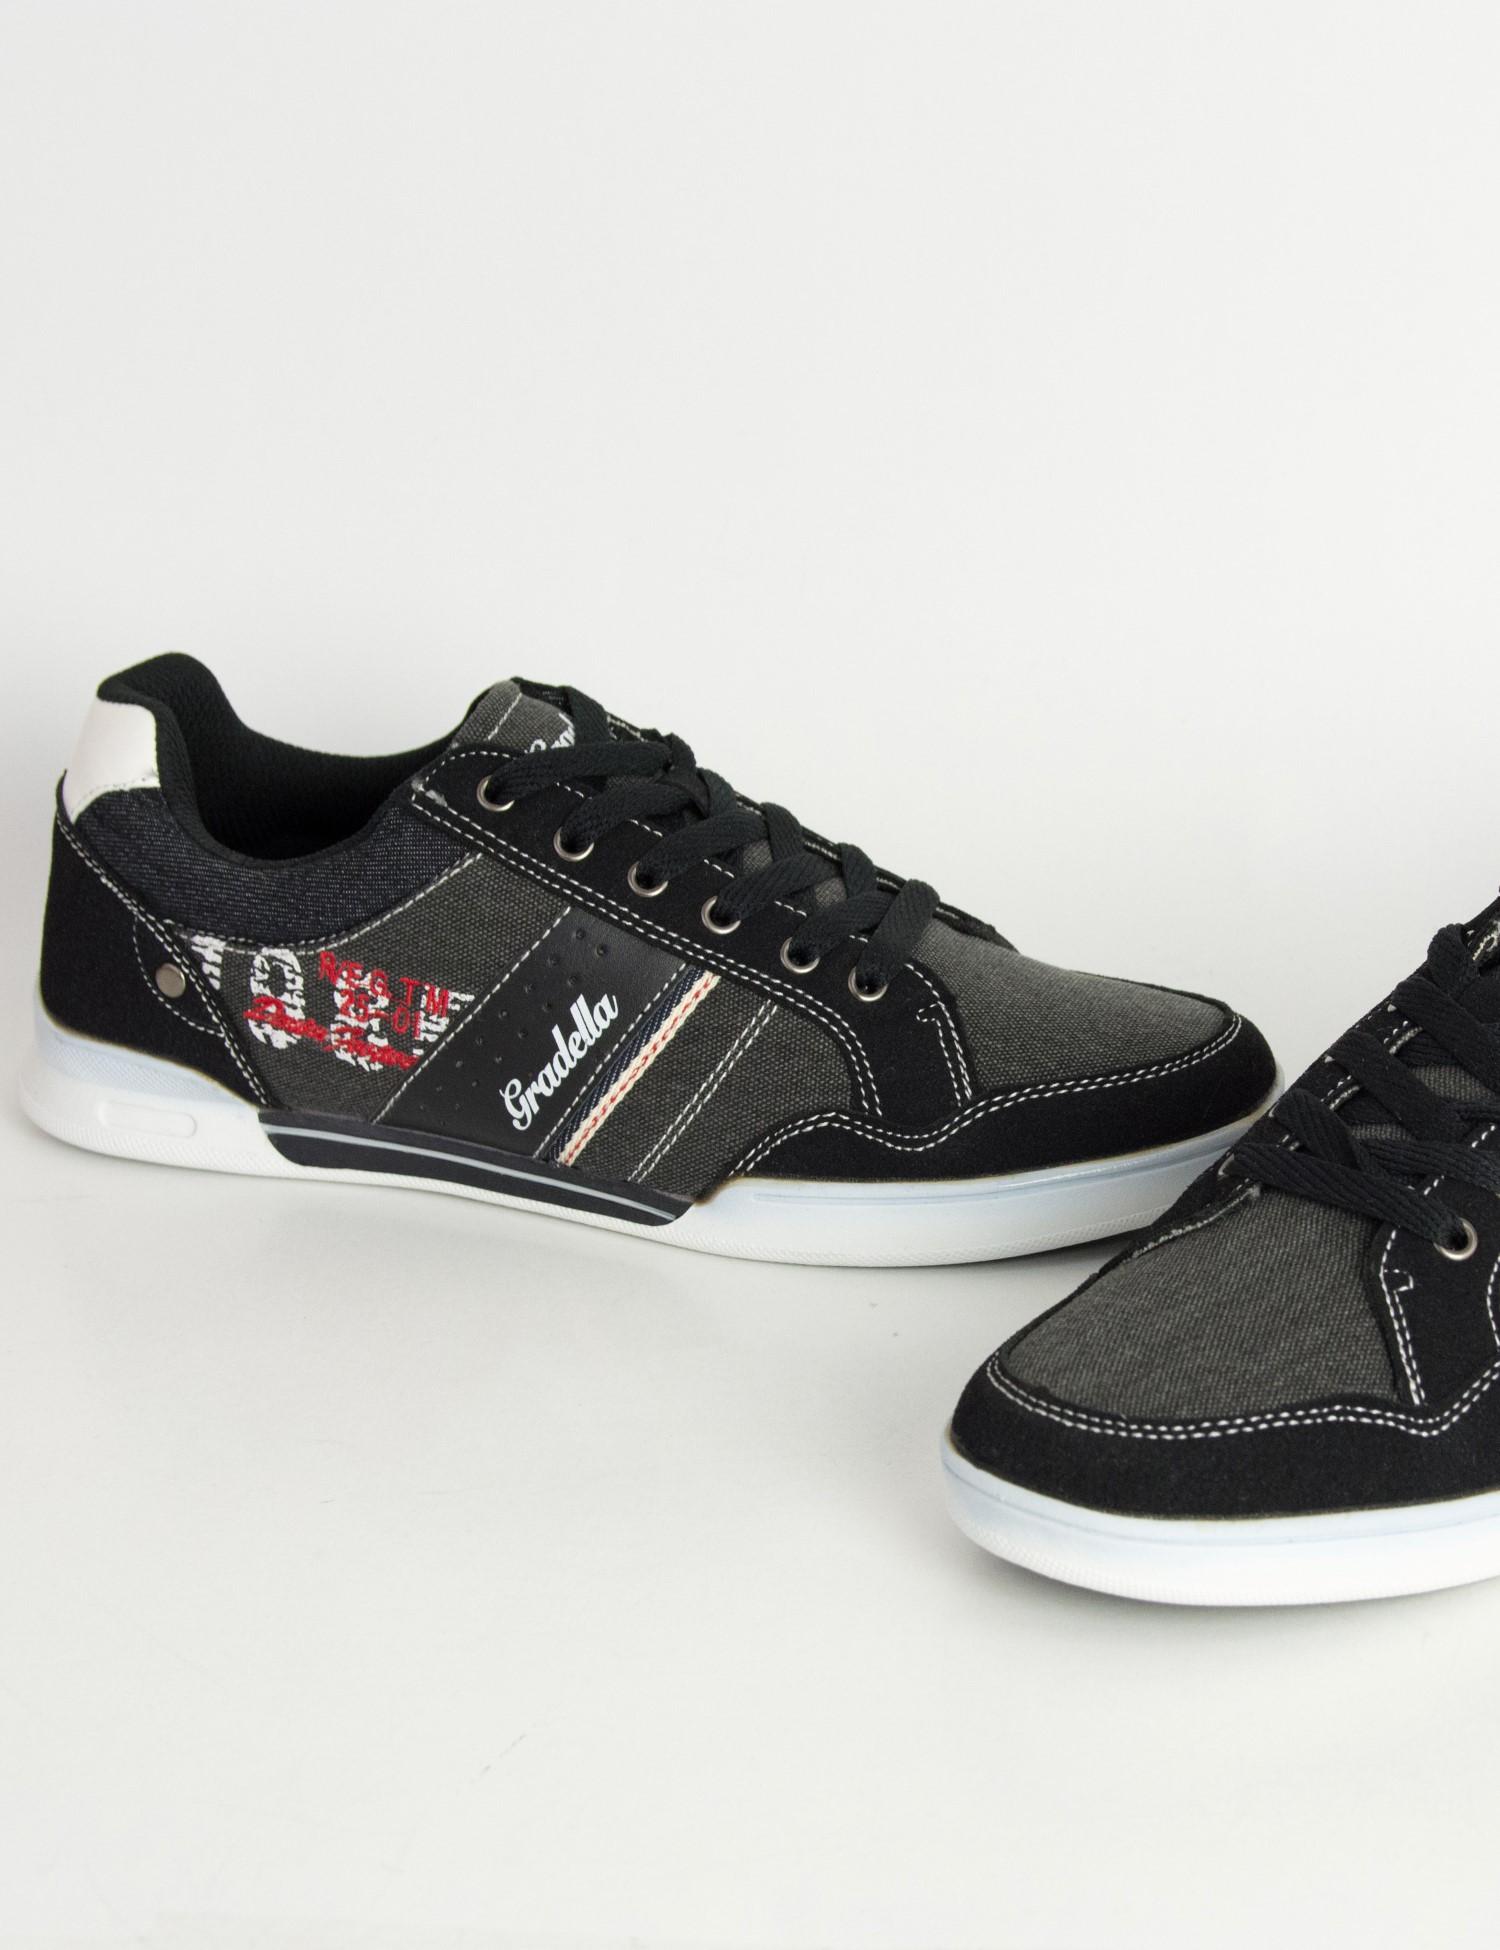 4cd20015056 Ανδρικά Casual παπούτσια μαύρα χαμηλά κορδόνια K70422